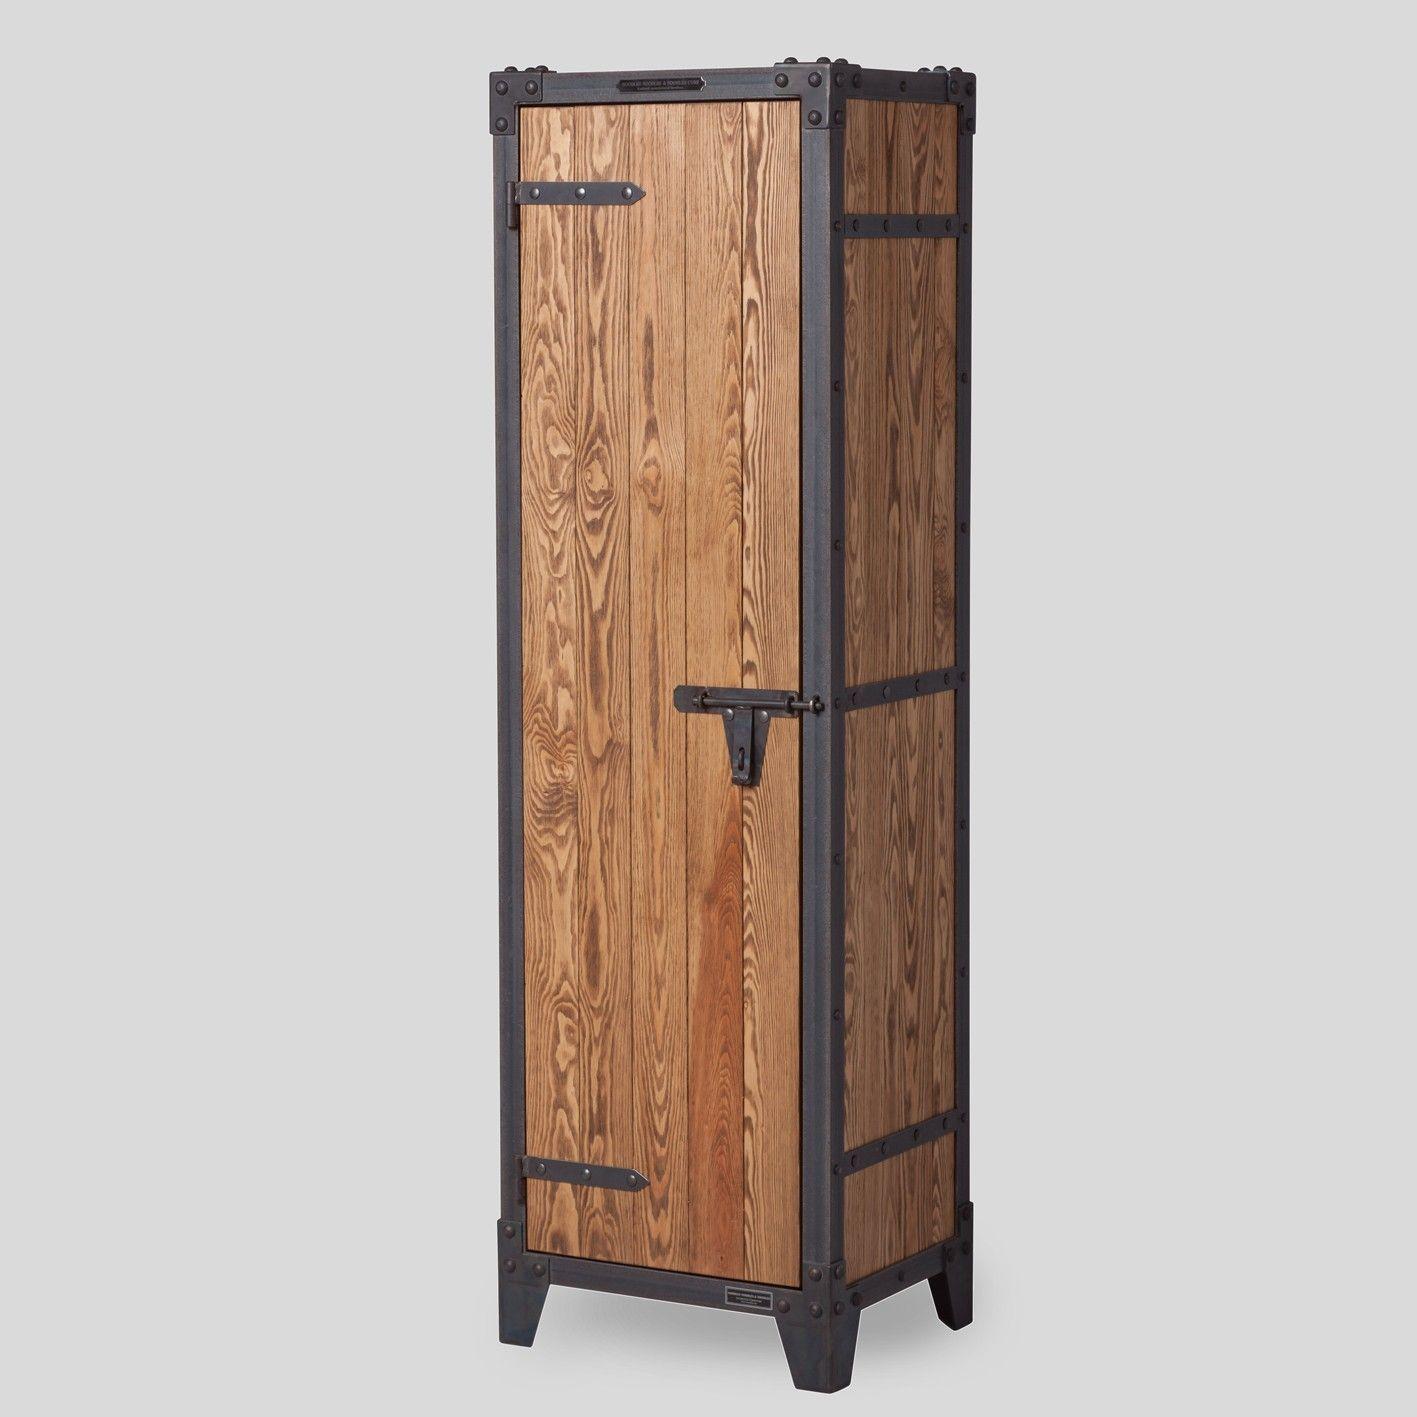 german schrank schrank w german inspiration pinterest german. Black Bedroom Furniture Sets. Home Design Ideas